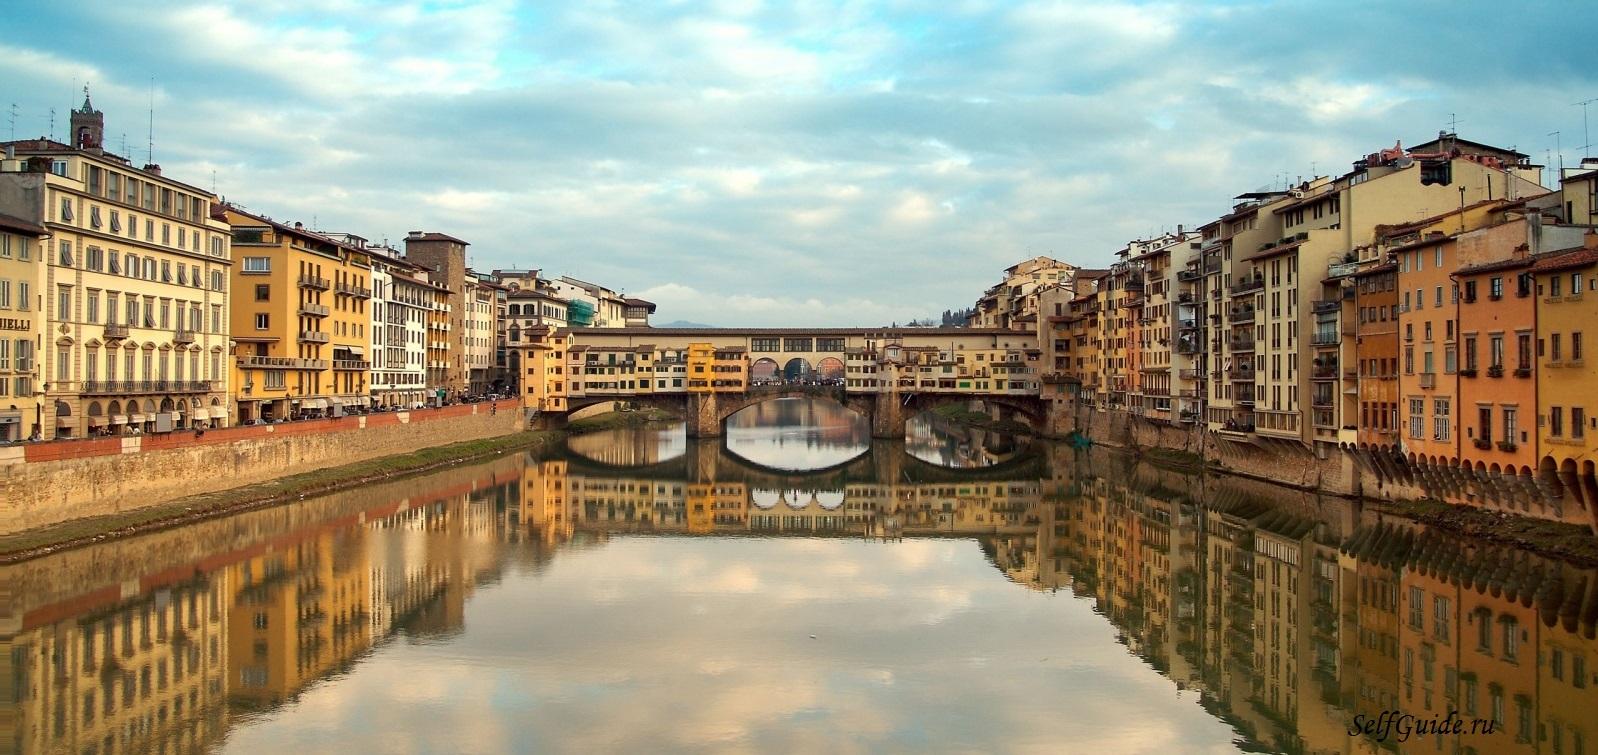 Транспорт во Флоренцию, как добраться во Флоренцию